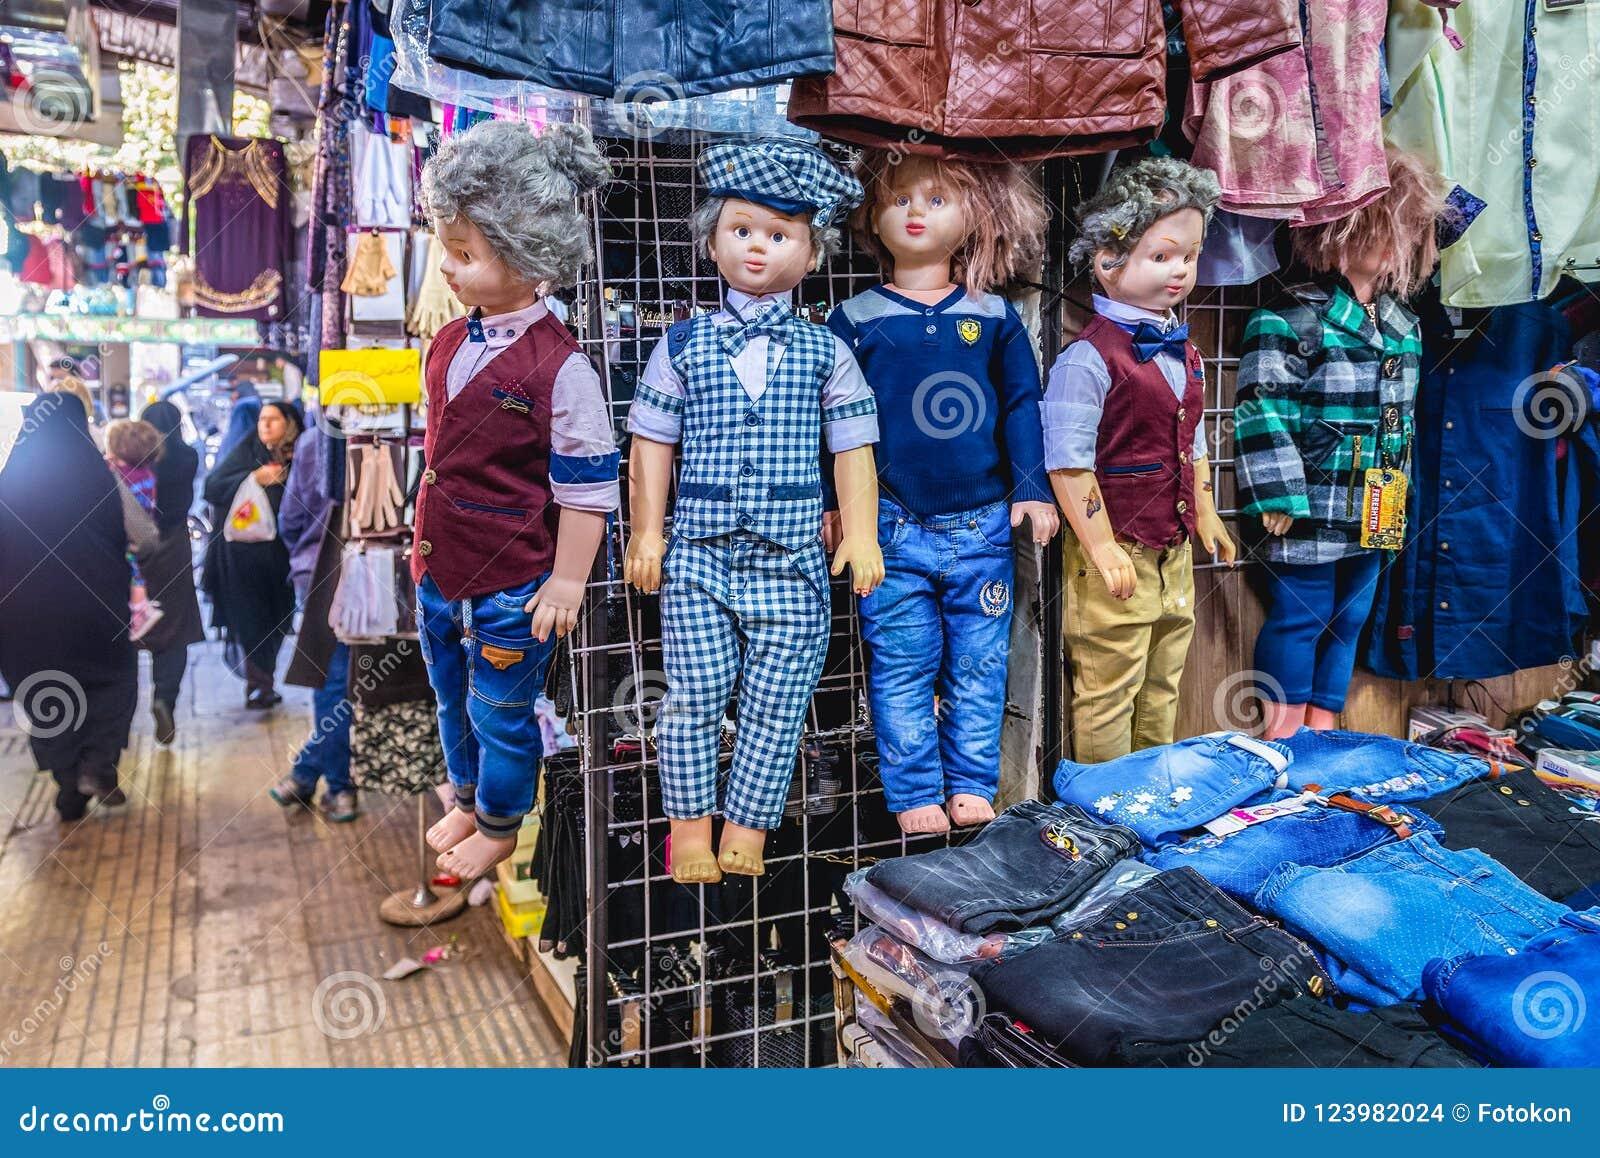 e4c178cb1df5 Bazaar in Shiraz editorial stock image. Image of dress - 123982024